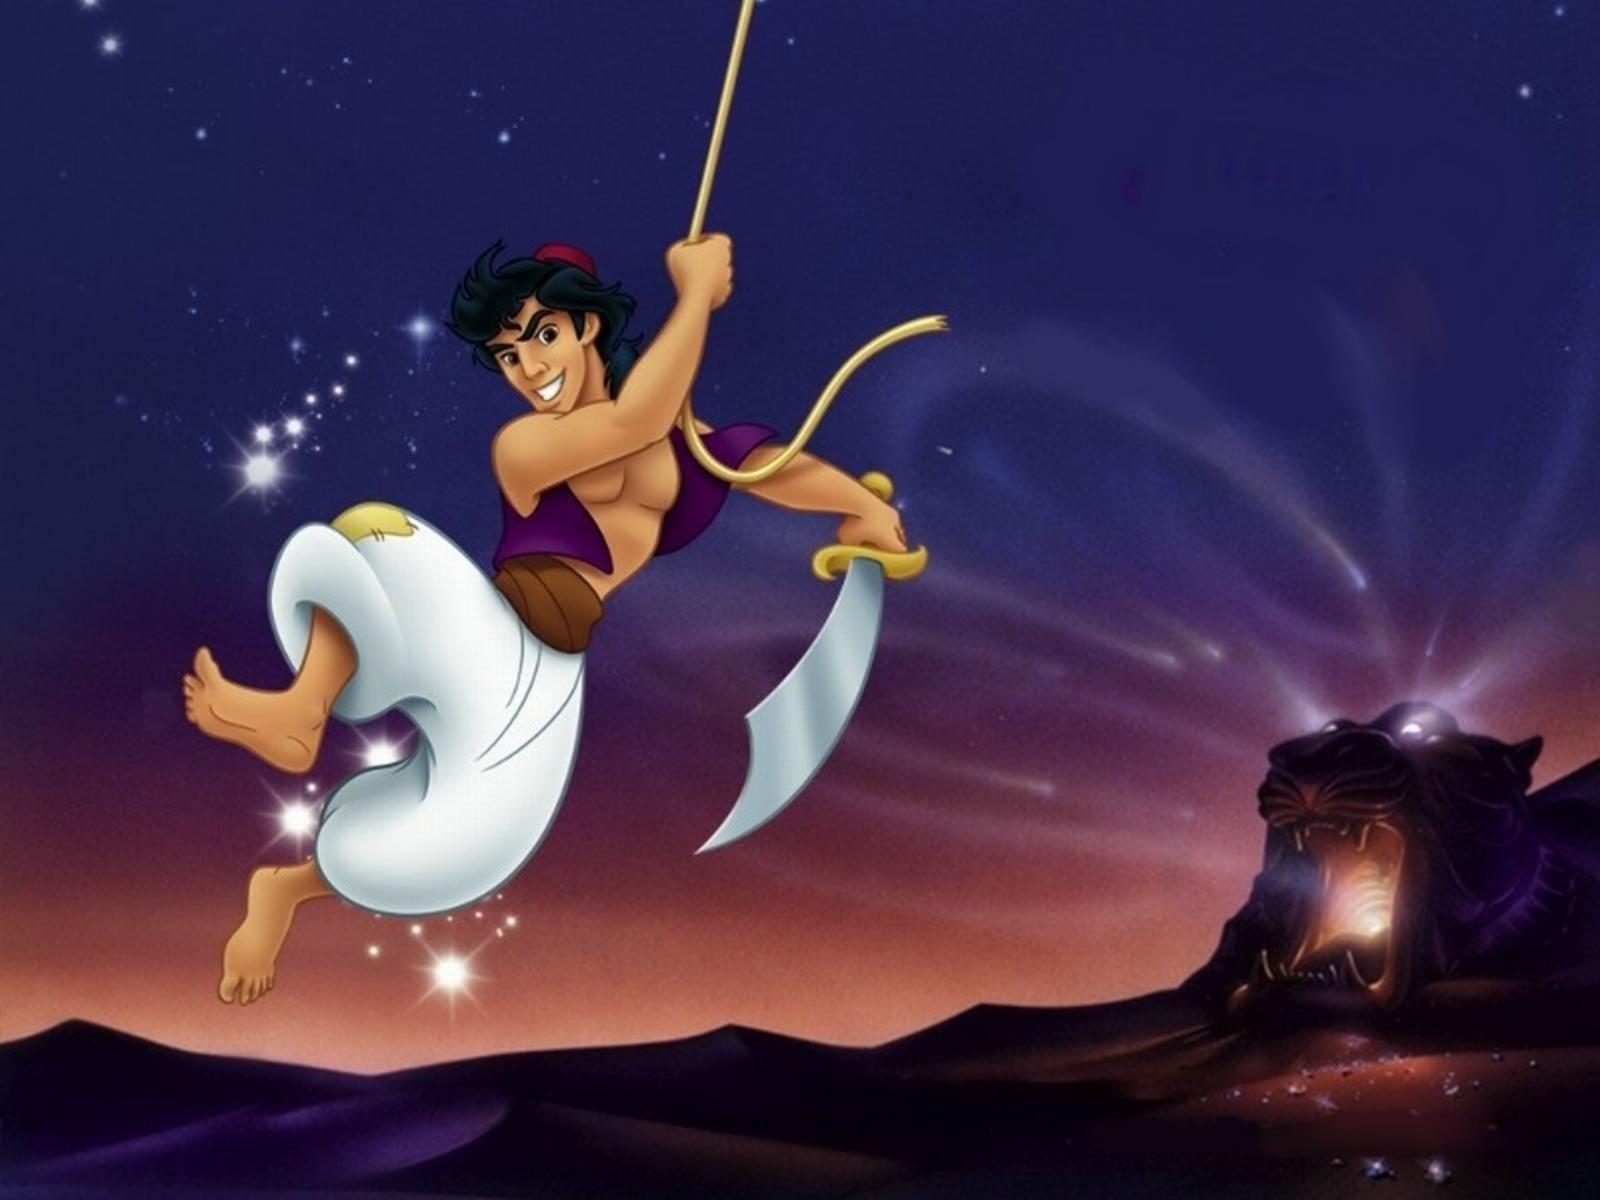 High Resolution Disney Wallpaper: Aladdin High Resolution Wallpapers 1080p